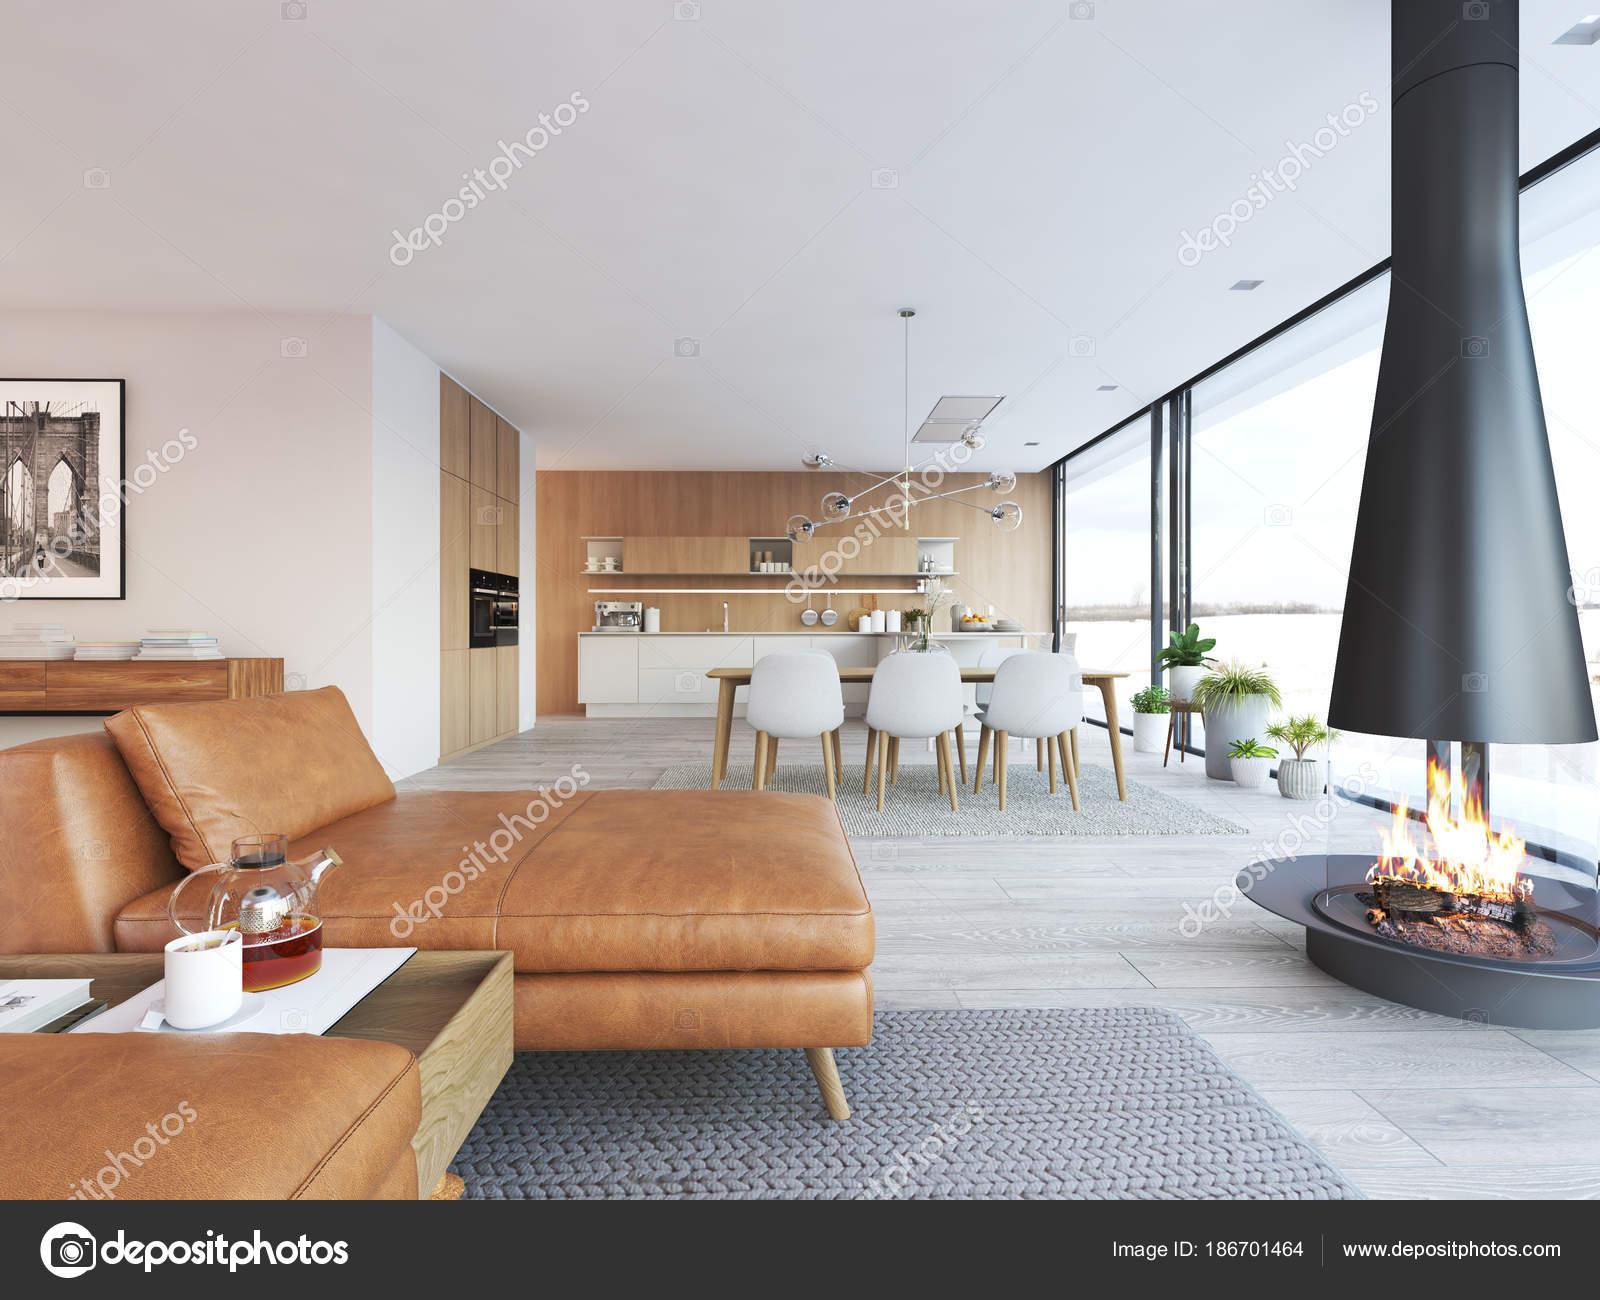 Moderne loft wohnung. 3d rendering u2014 stockfoto © 2mmedia #186701464